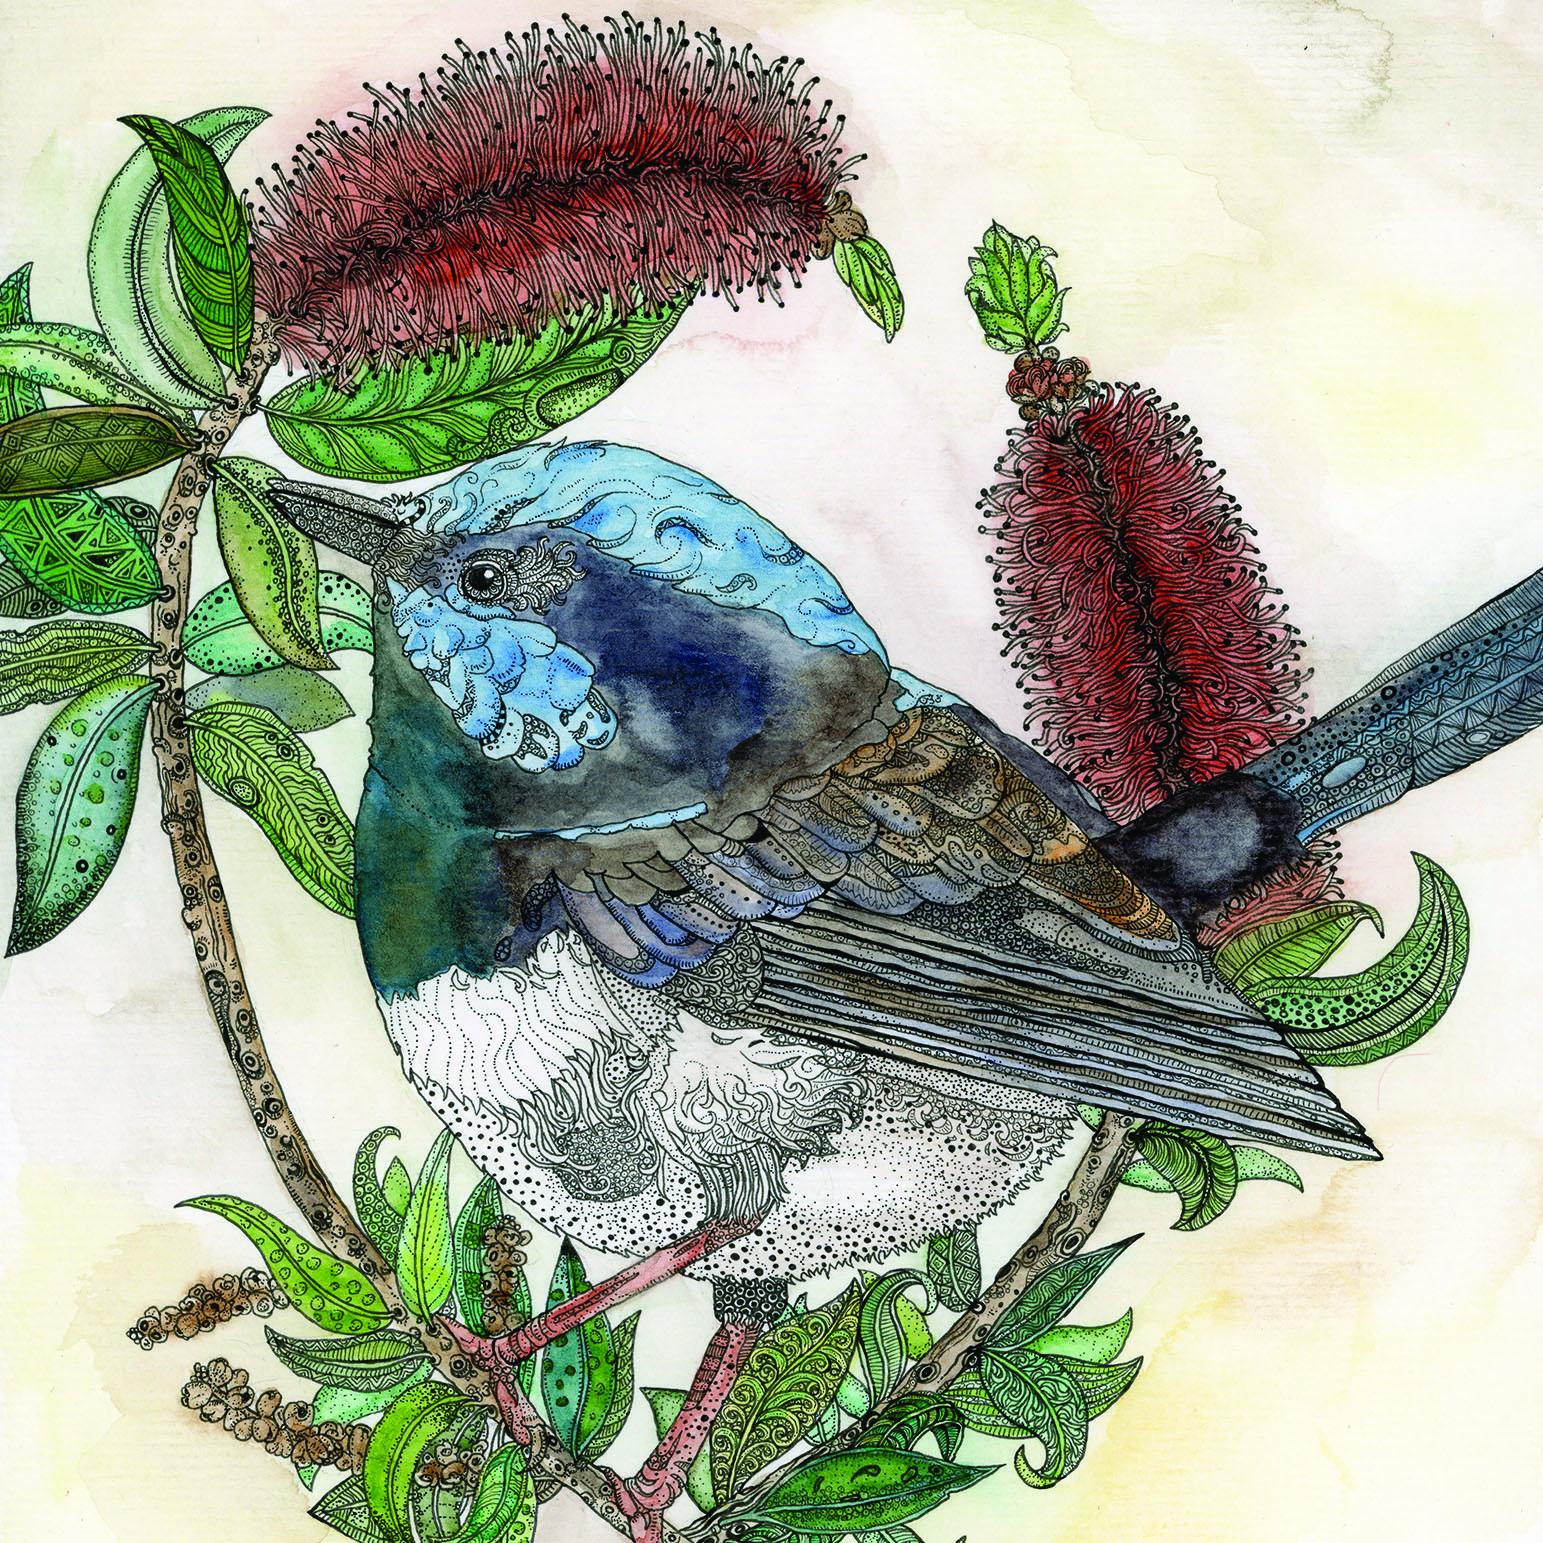 Zinia King Illustration